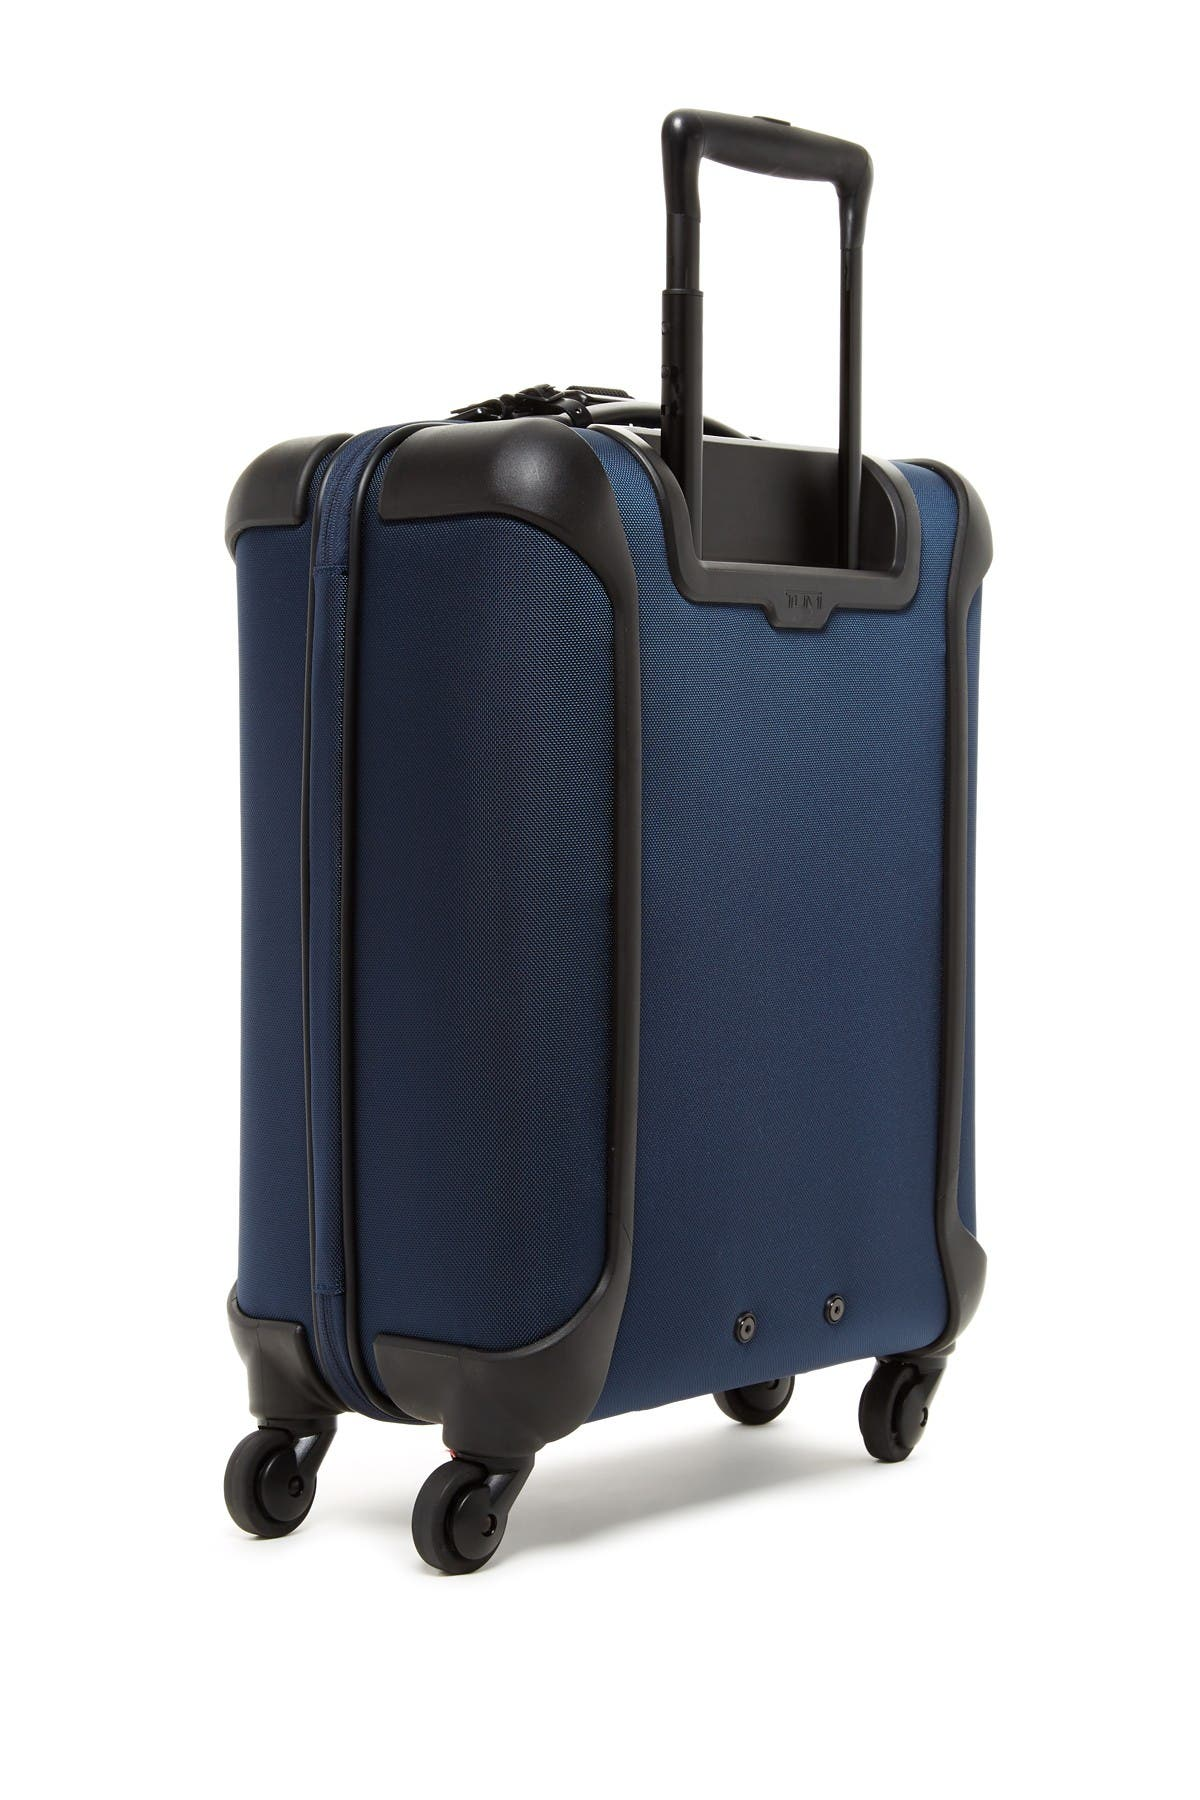 "Image of Tumi Lightweight 21"" Nylon Continental Carry-On"